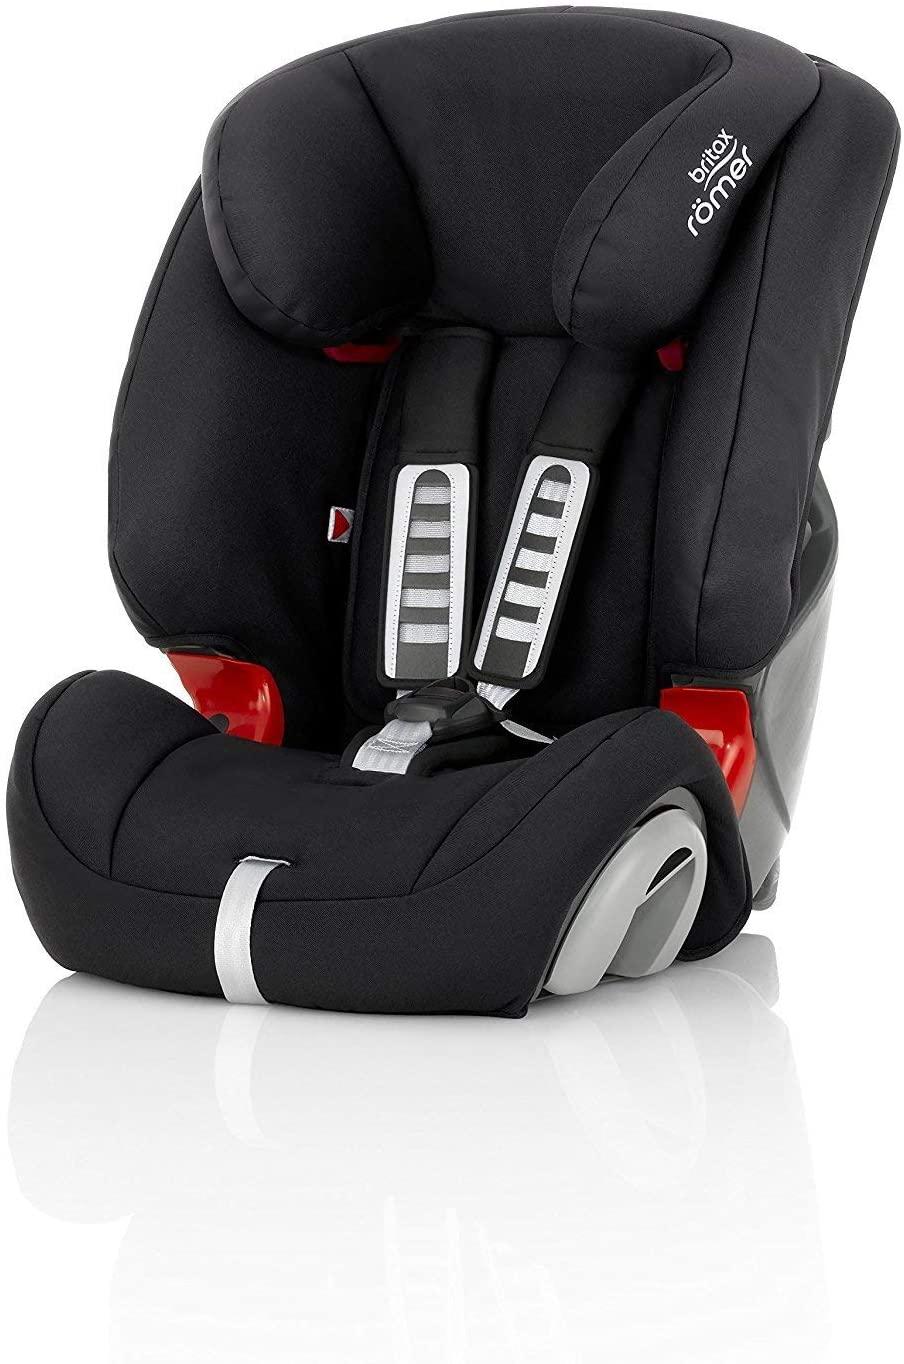 Britax Römer car seat 9-36 kg, EVOLVA 123 group 1/2/3 £30 @ Lidl (Leicester)